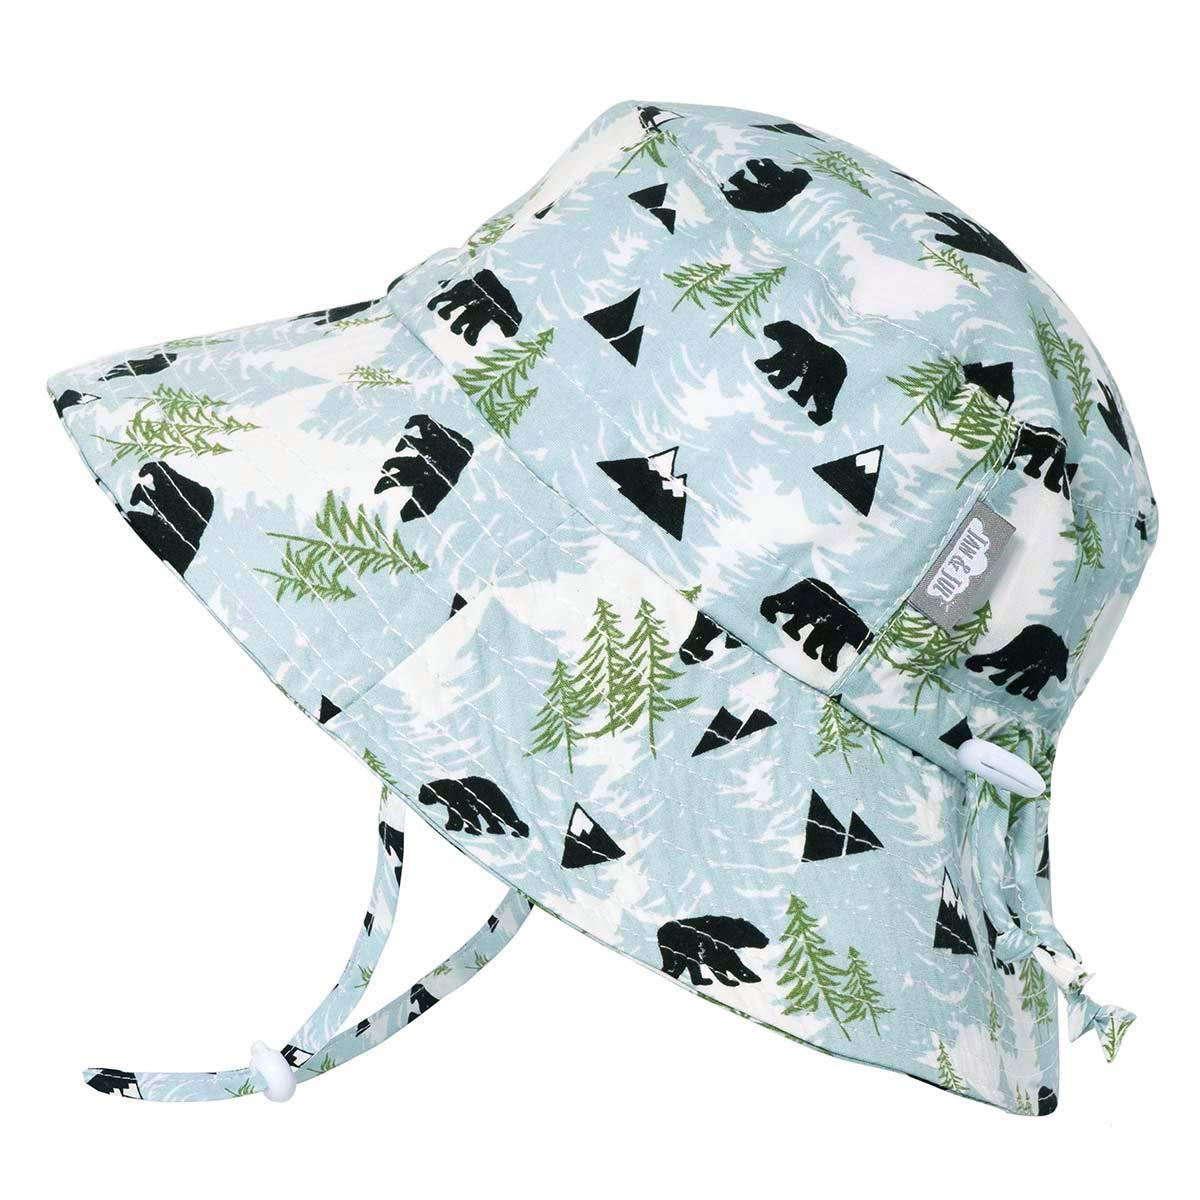 JAN & JUL Boys Breathable Bucket Style Sun Hat 50 UPF, Adjustable Strap, Foldable (XL: 5-12Y, Bear)